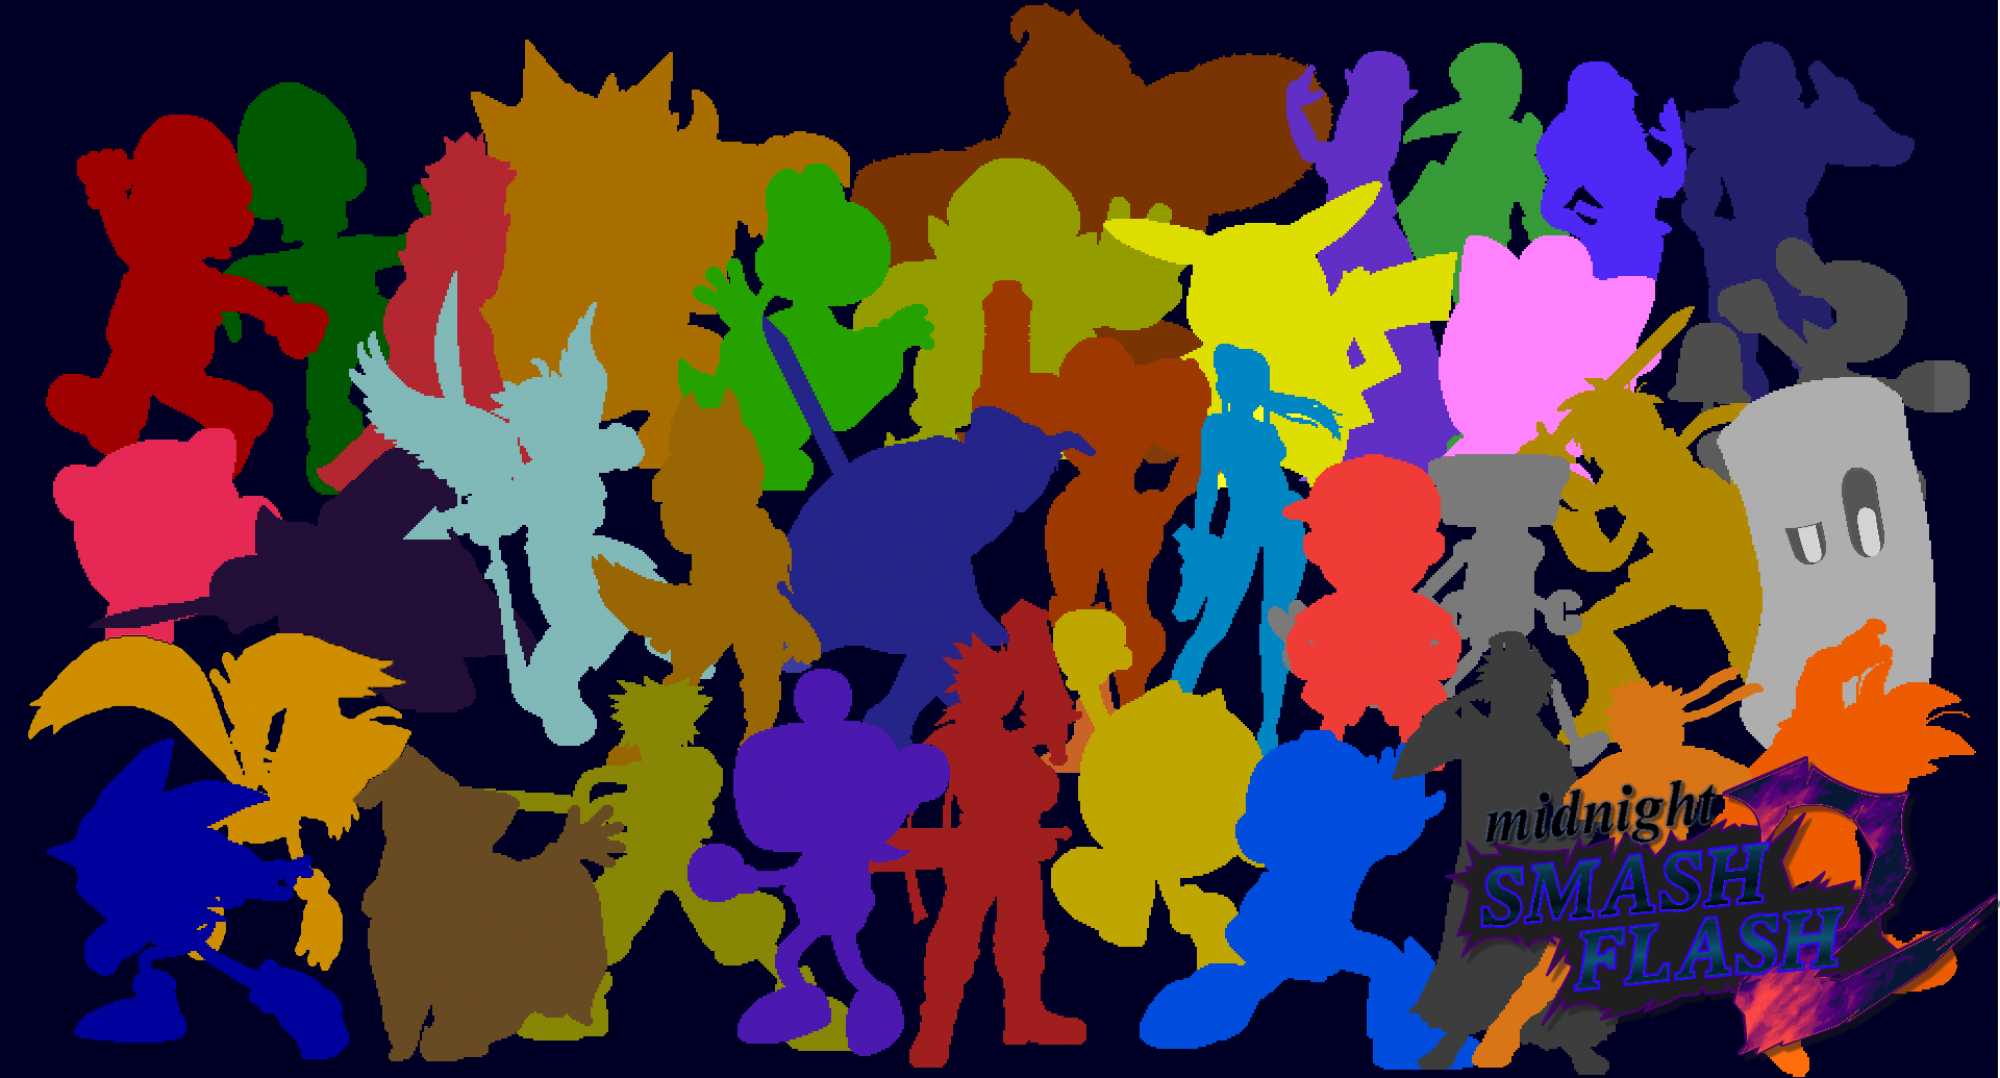 Super Smash Flash 2 Wallpapers Top Free Super Smash Flash 2